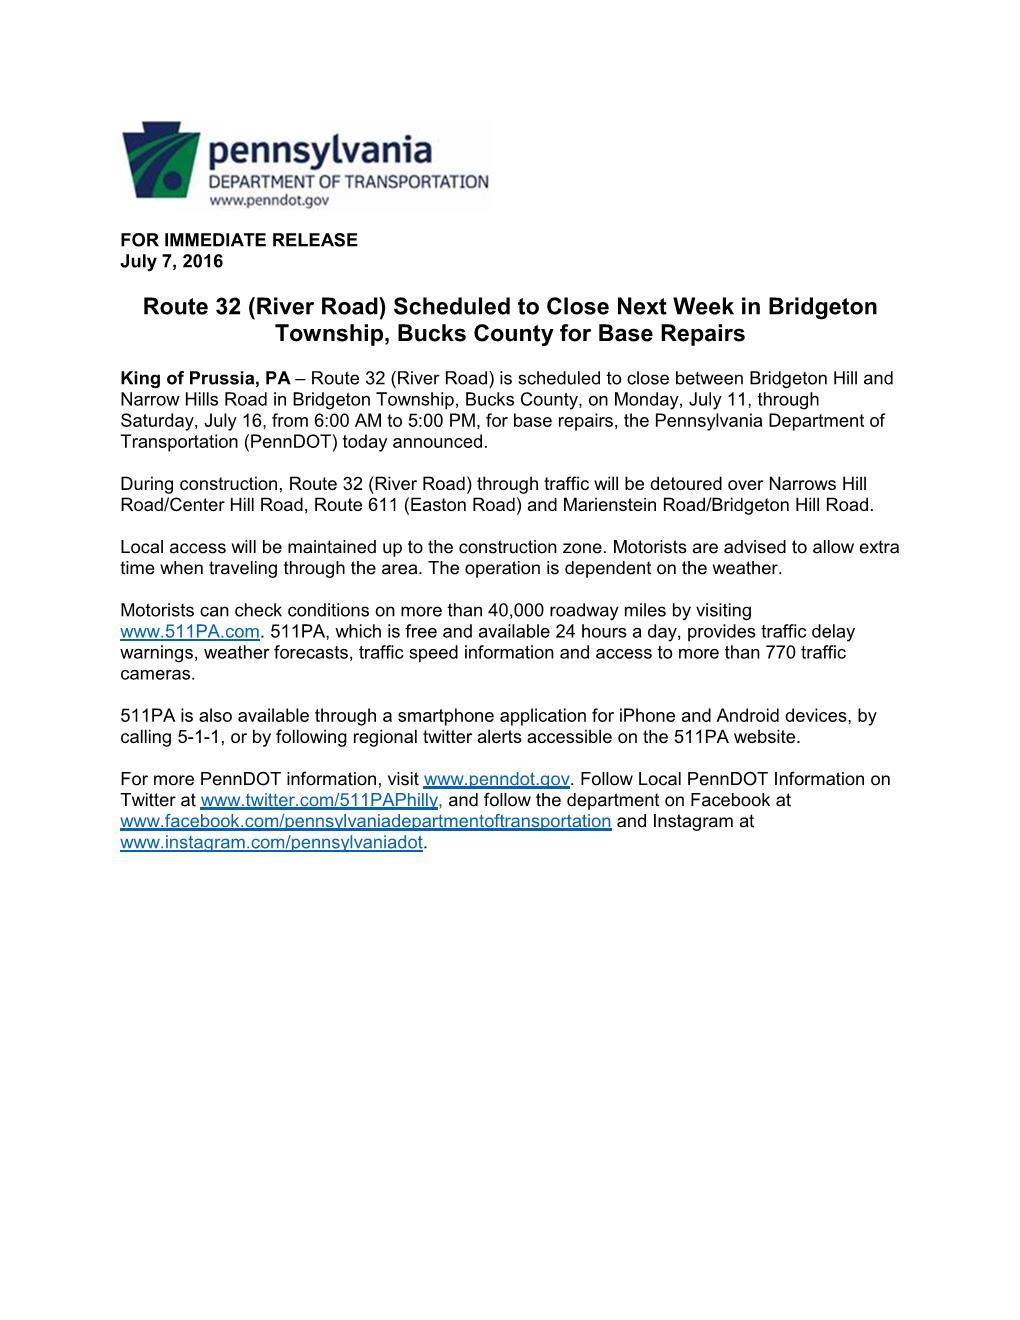 River Road Repairs July 11- 16 Bridgeton Hill-Narrows Hill